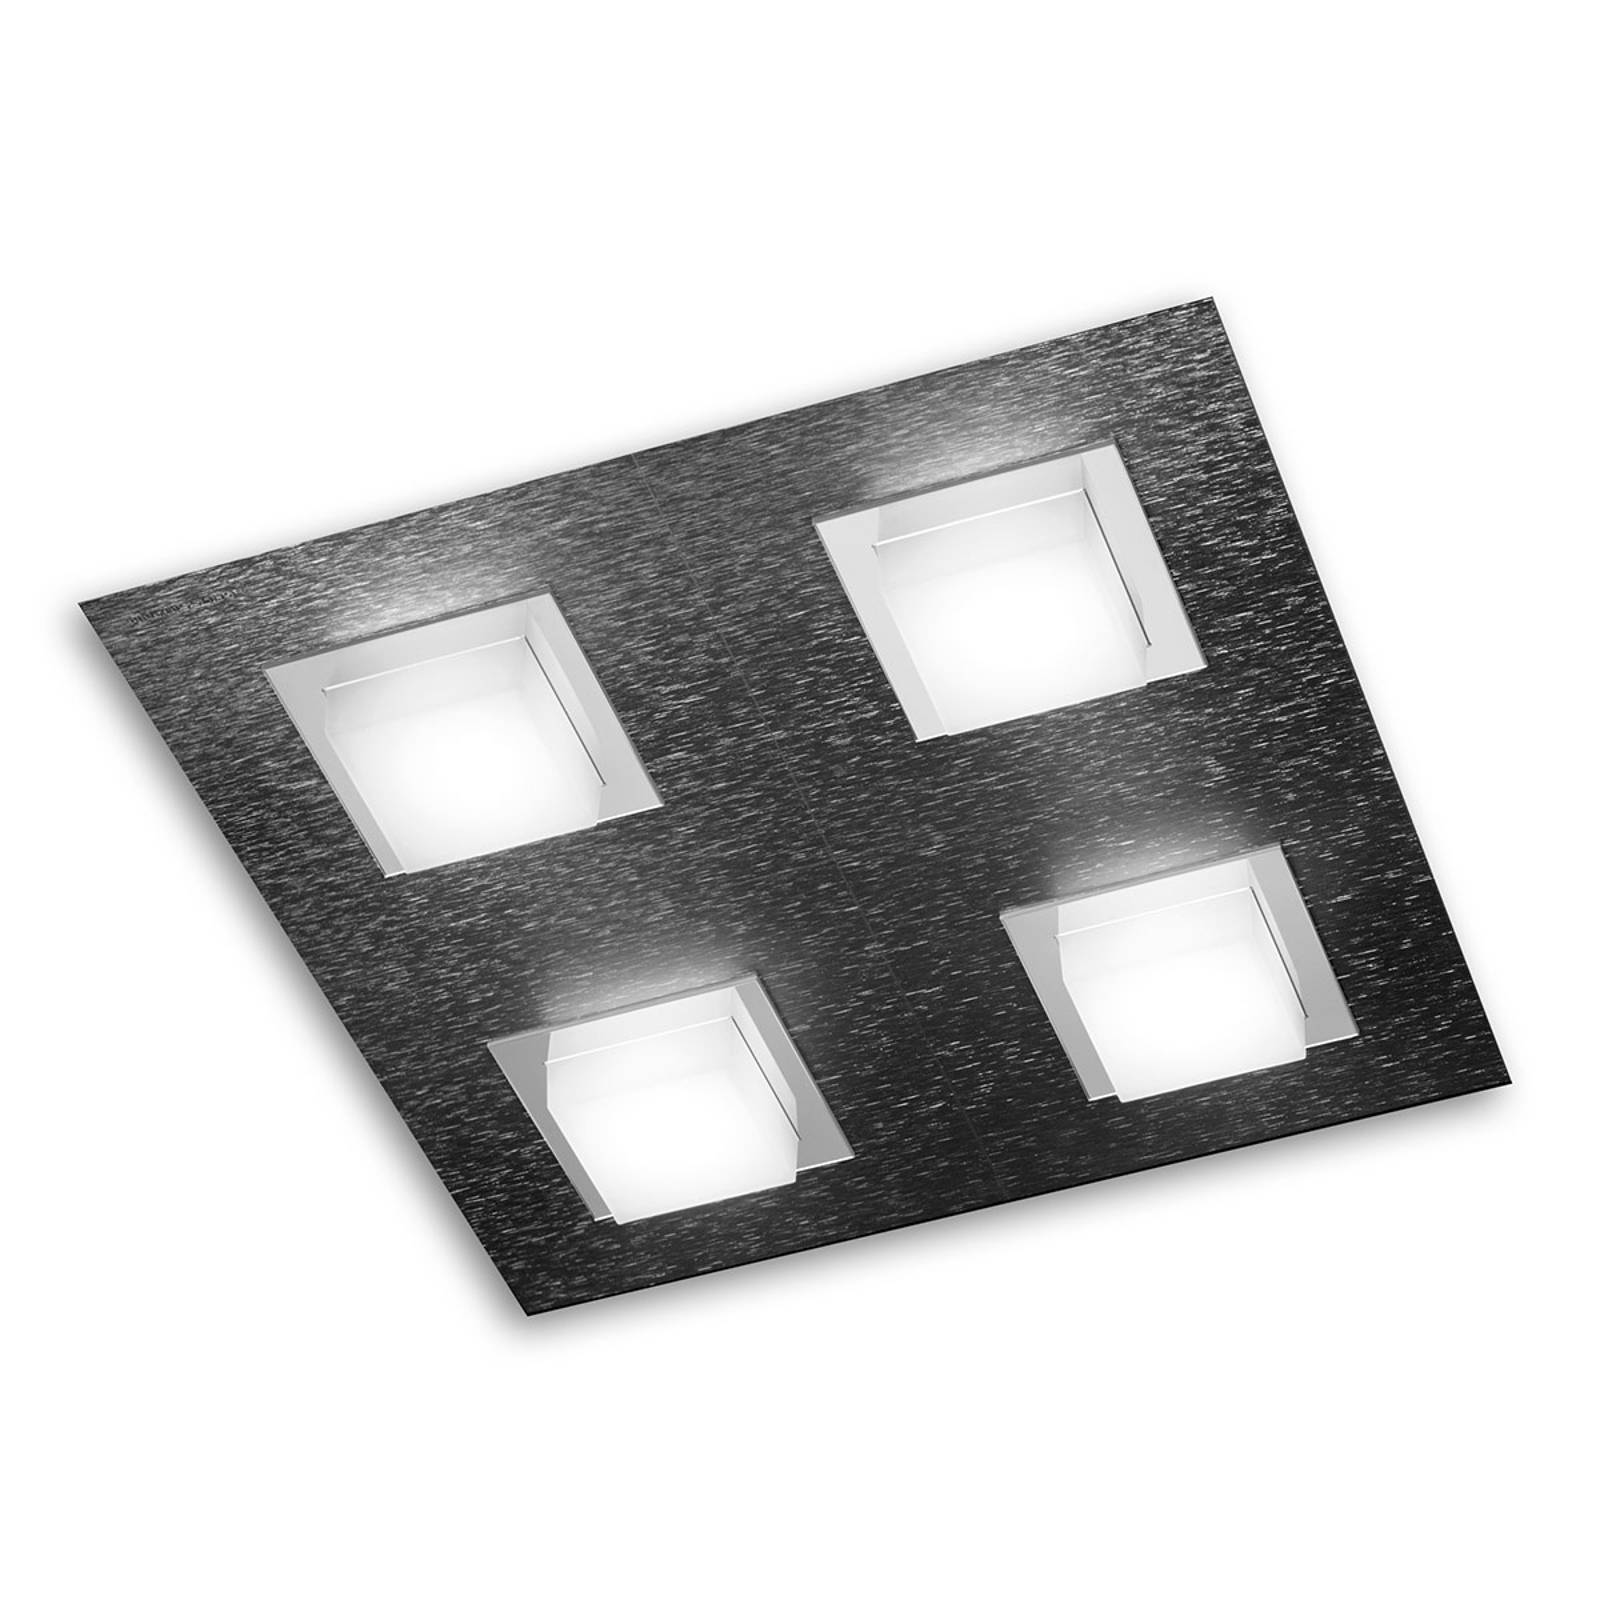 GROSSMANN Basic LED-valaisin 4-lampp., antrasiitti